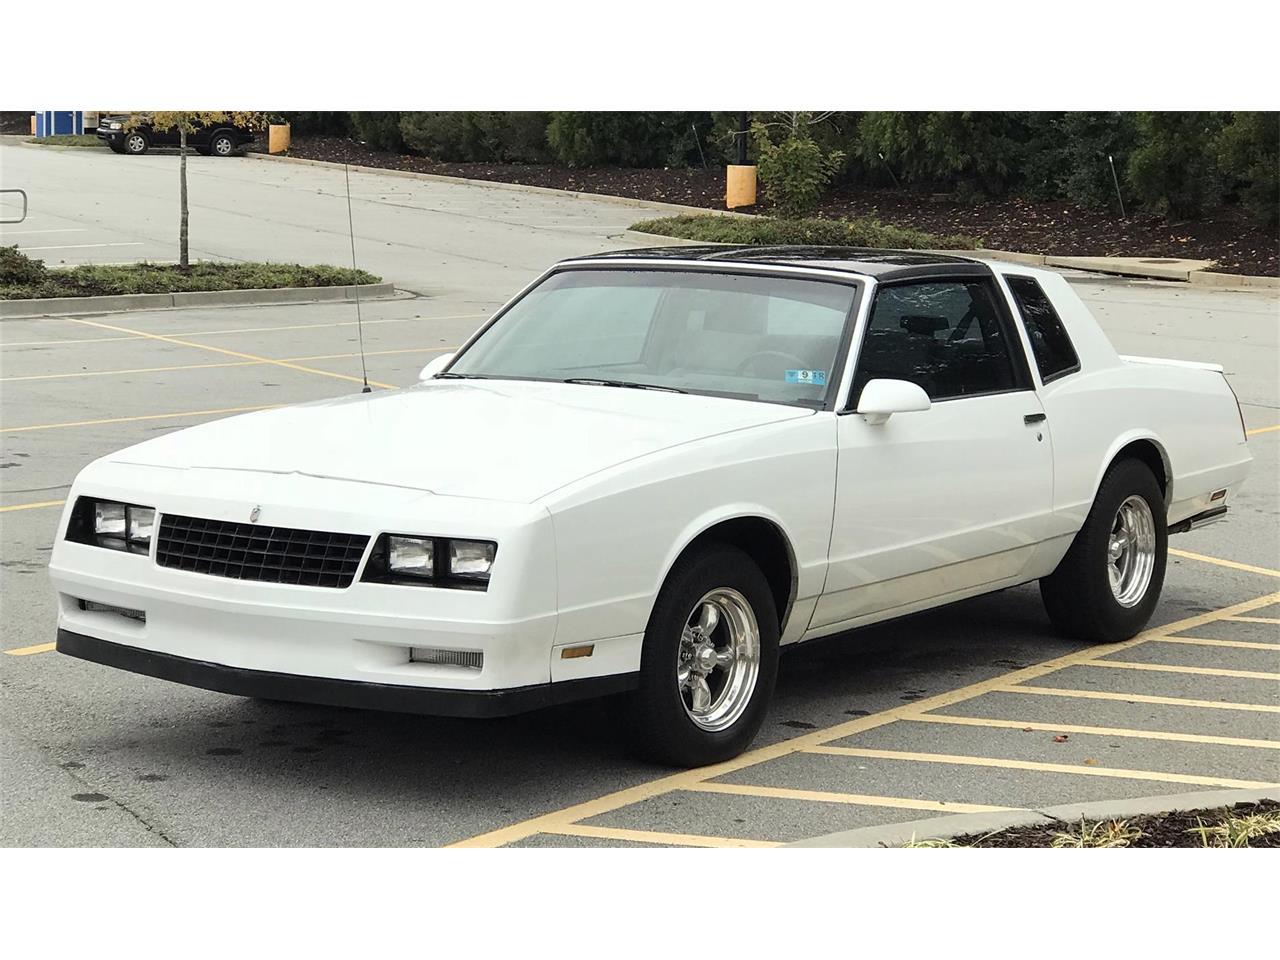 Ss Monte Carlo >> 1988 Chevrolet Monte Carlo Ss For Sale Classiccars Com